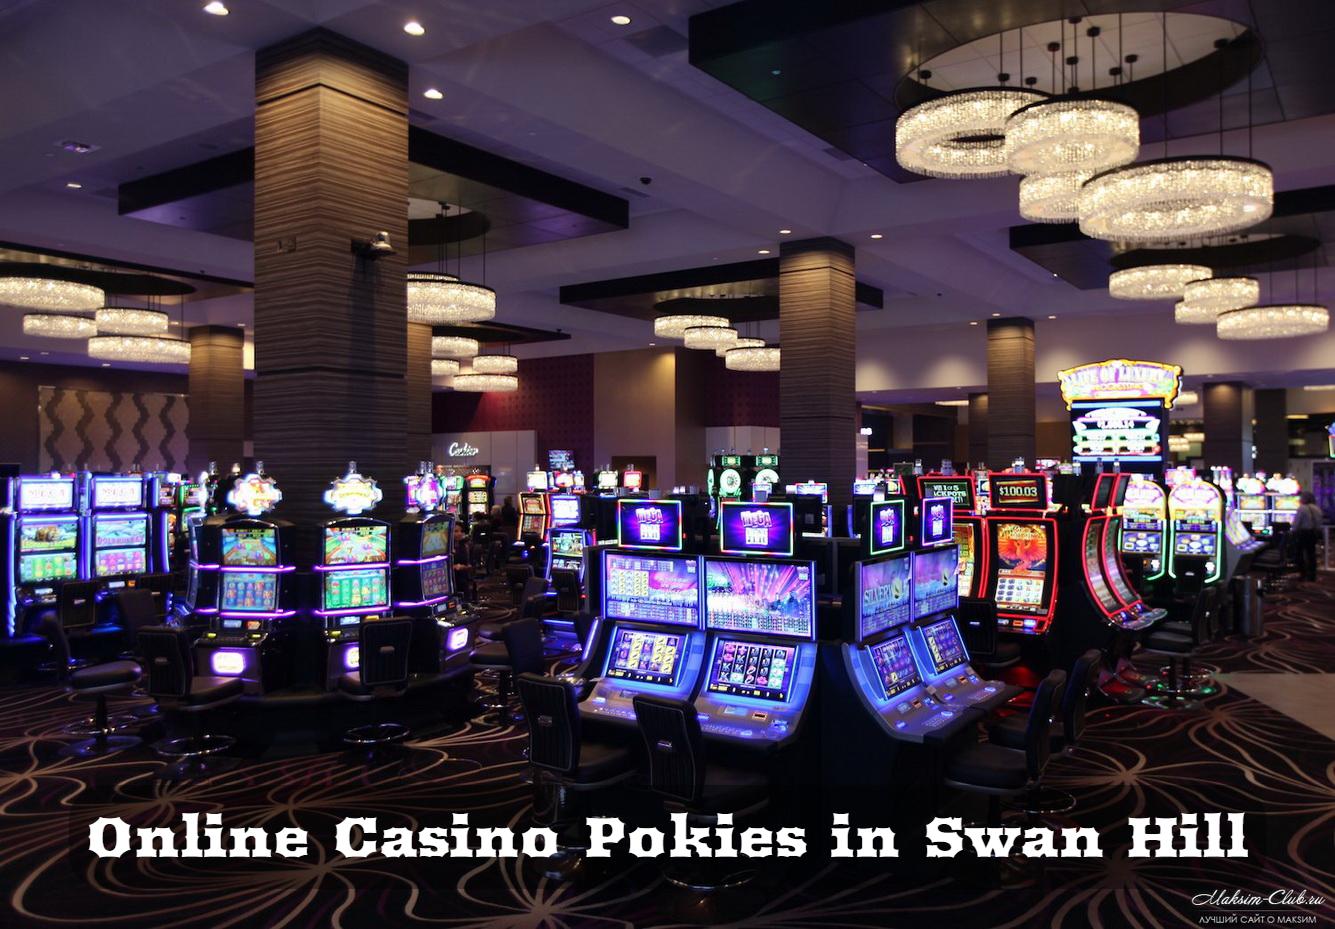 Online Casino Pokies in Swan Hill